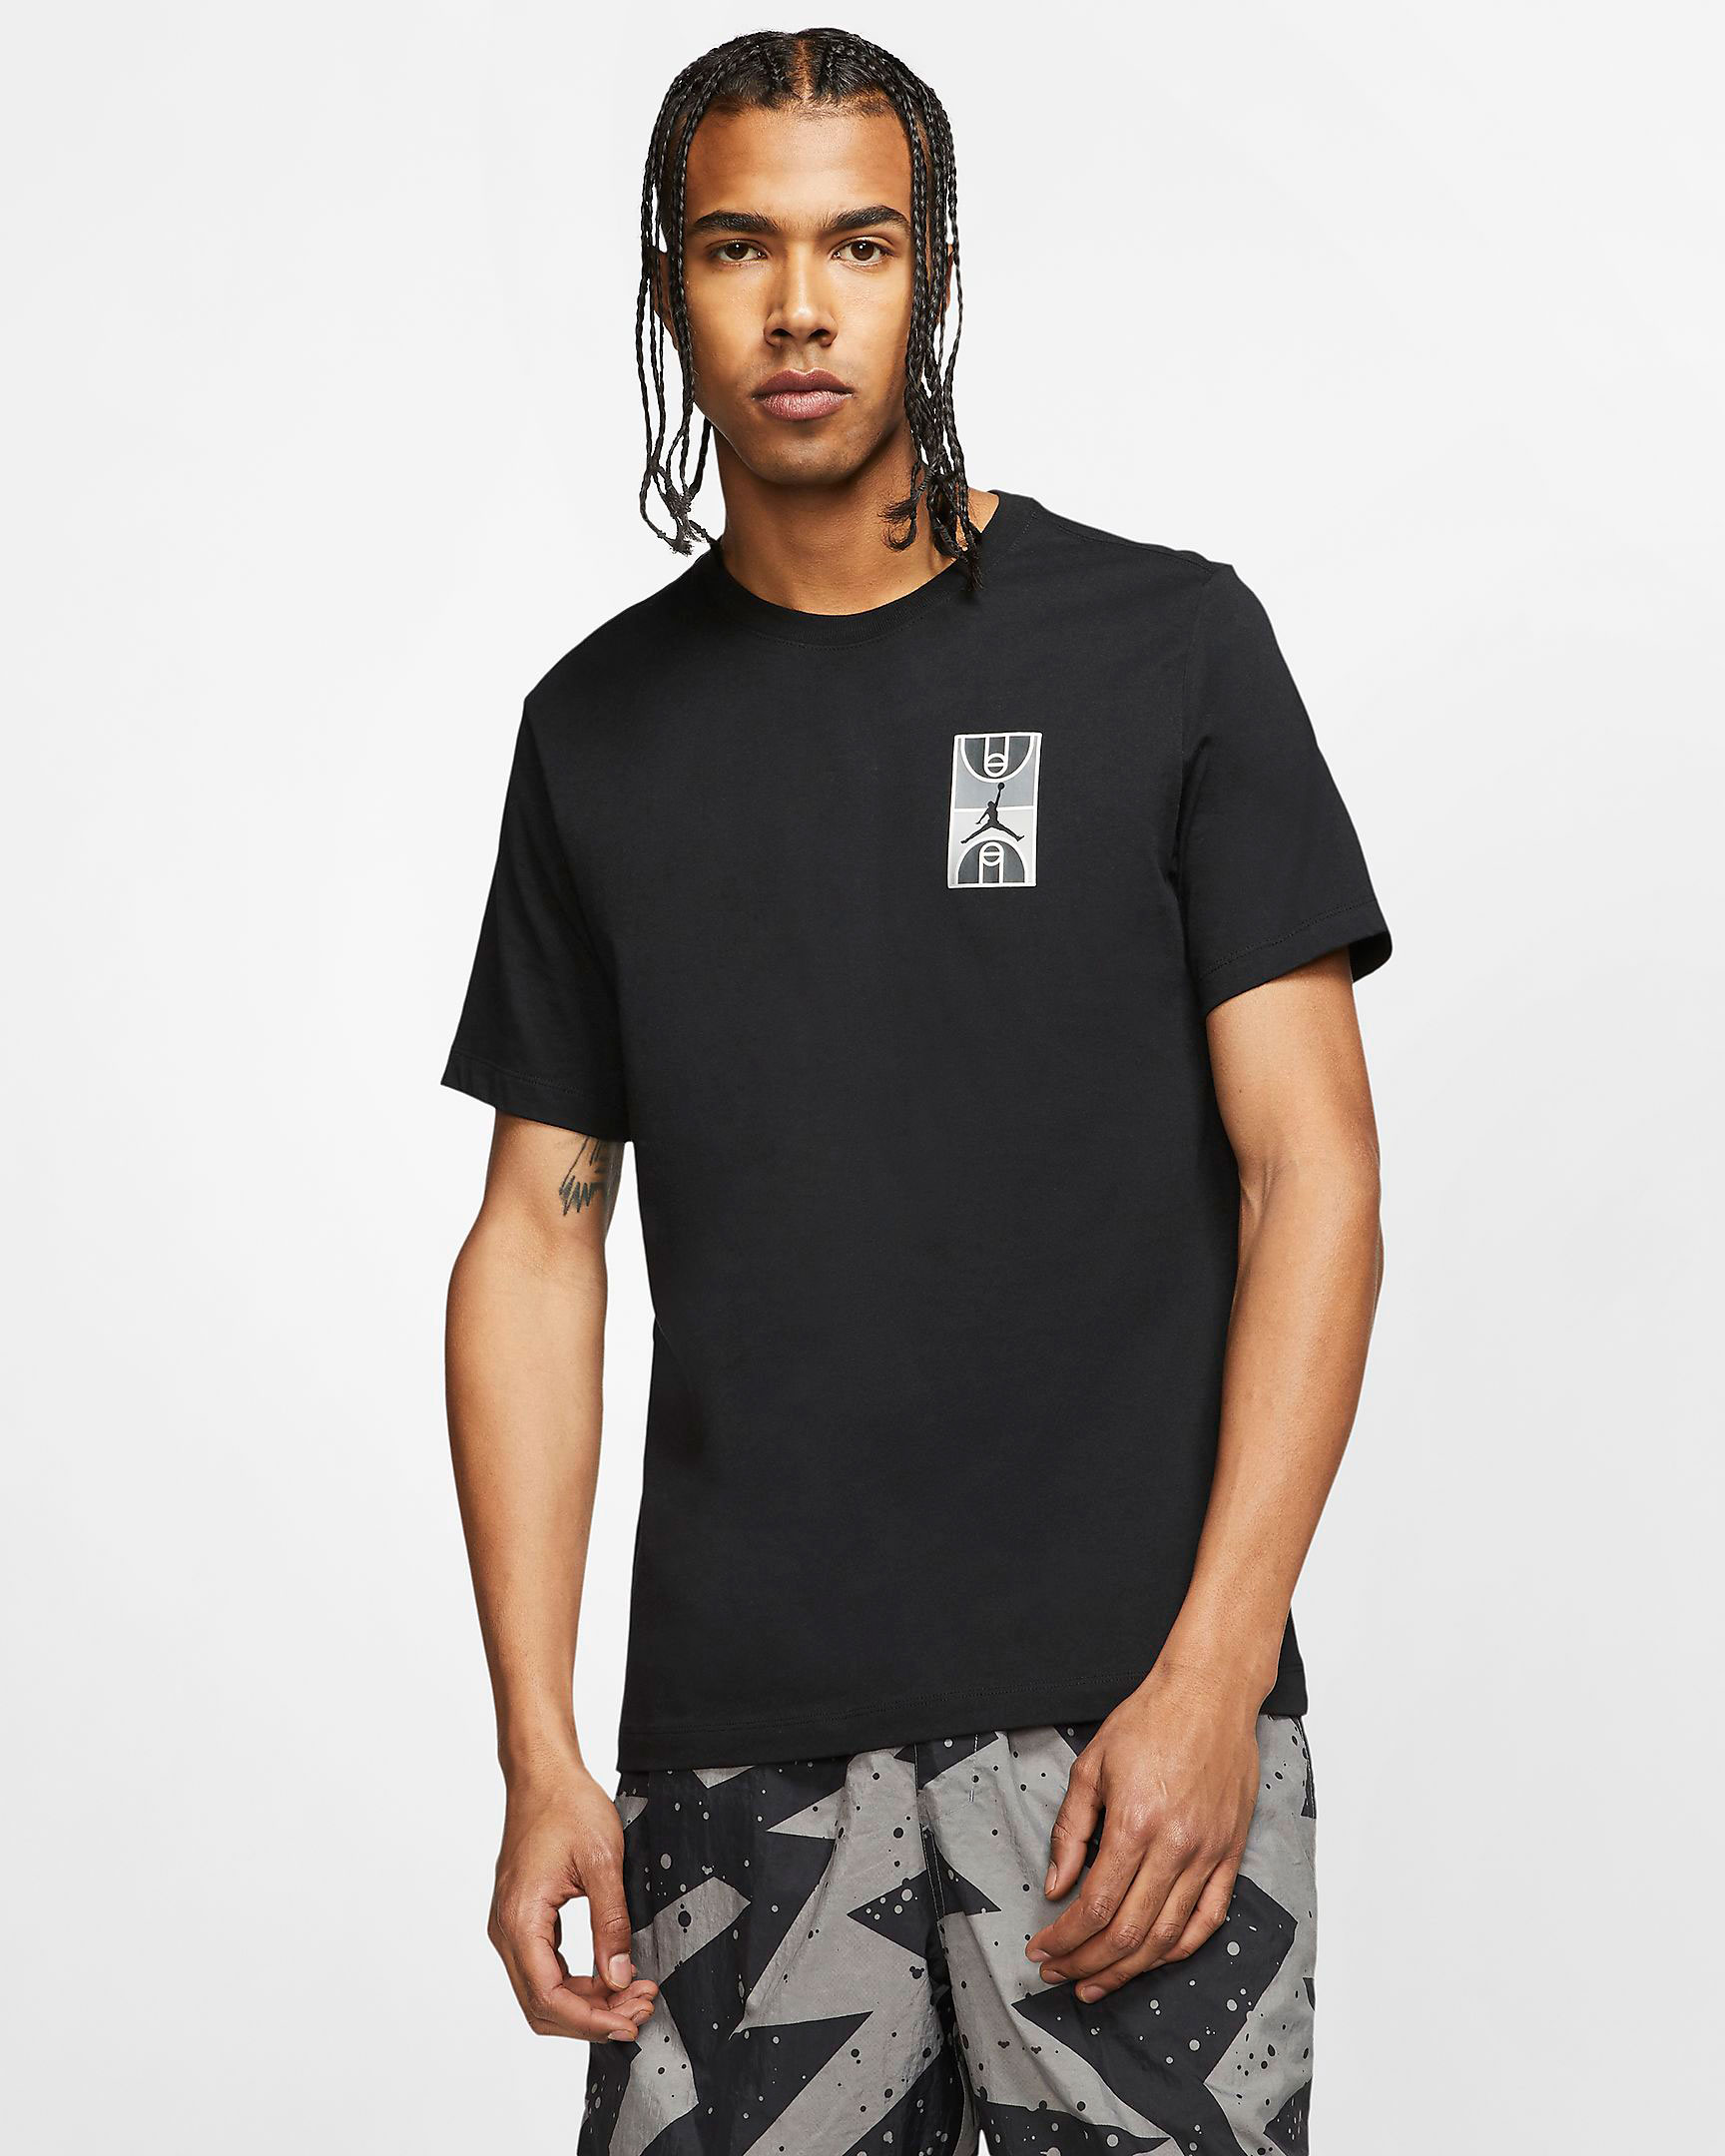 jordan-court-shirt-black-grey-1